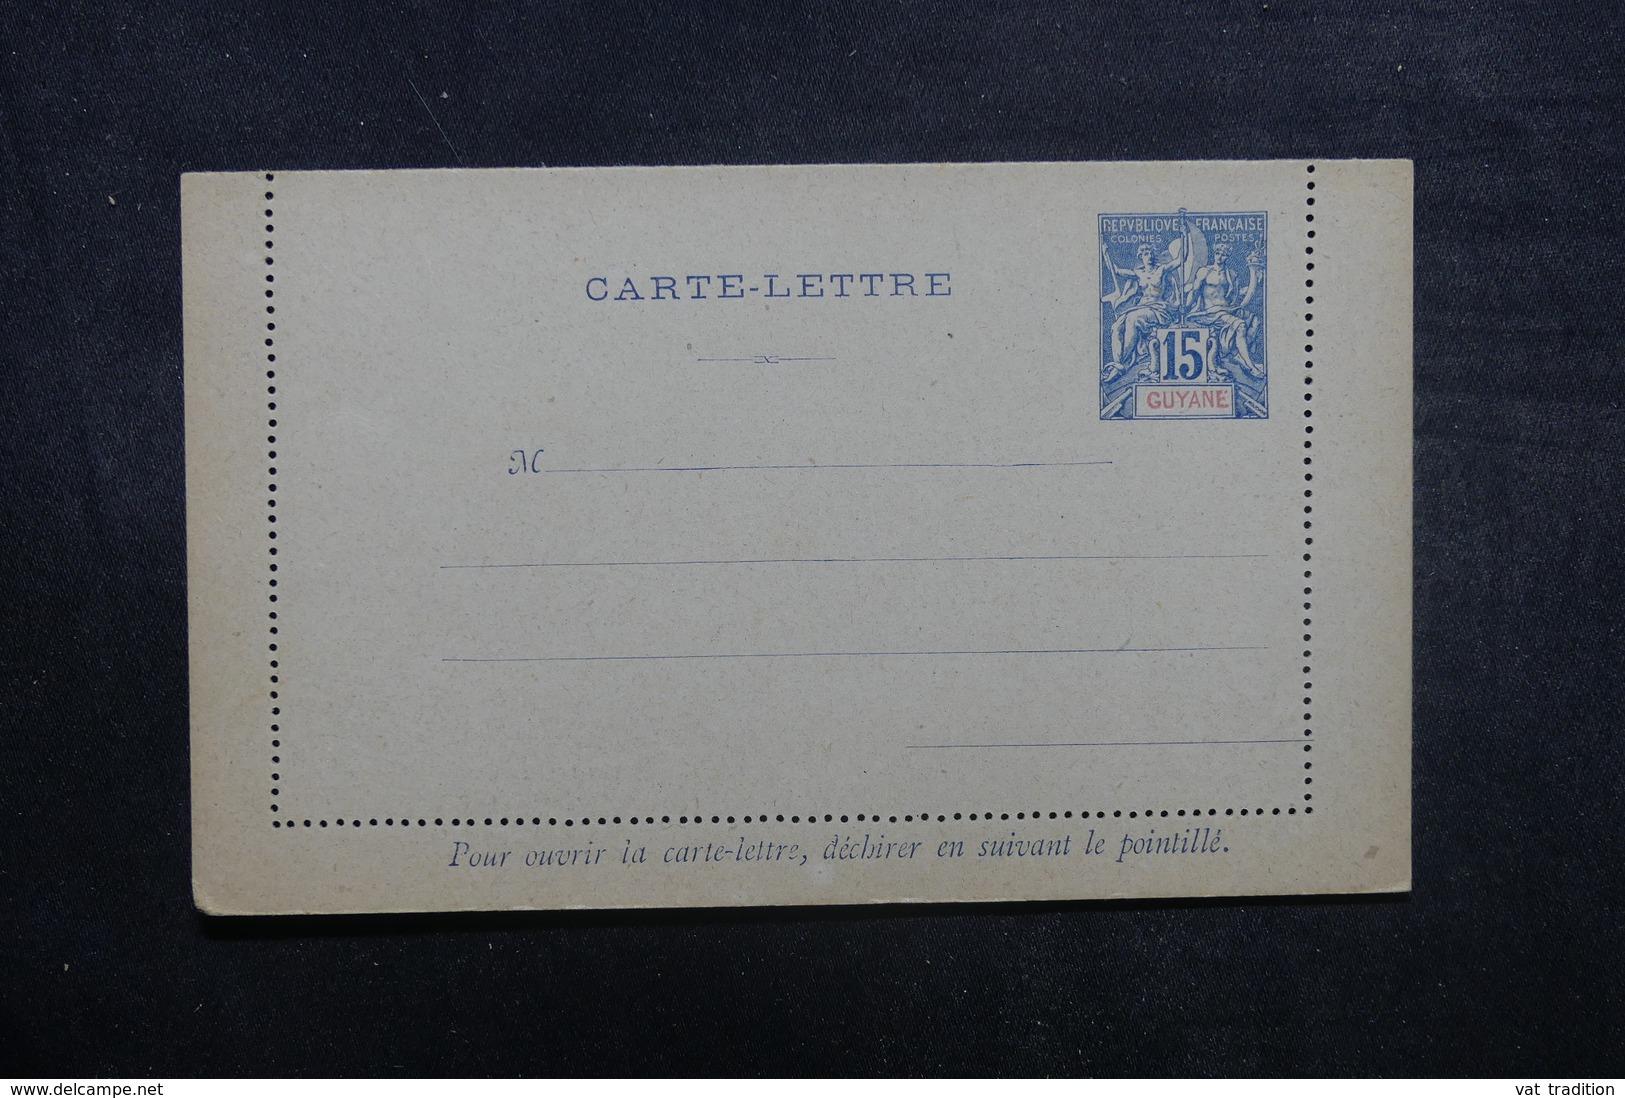 GUYANE - Entier Postal ( Carte Lettre ) Type Groupe Non Circulé - L 37969 - Guyane Française (1886-1949)